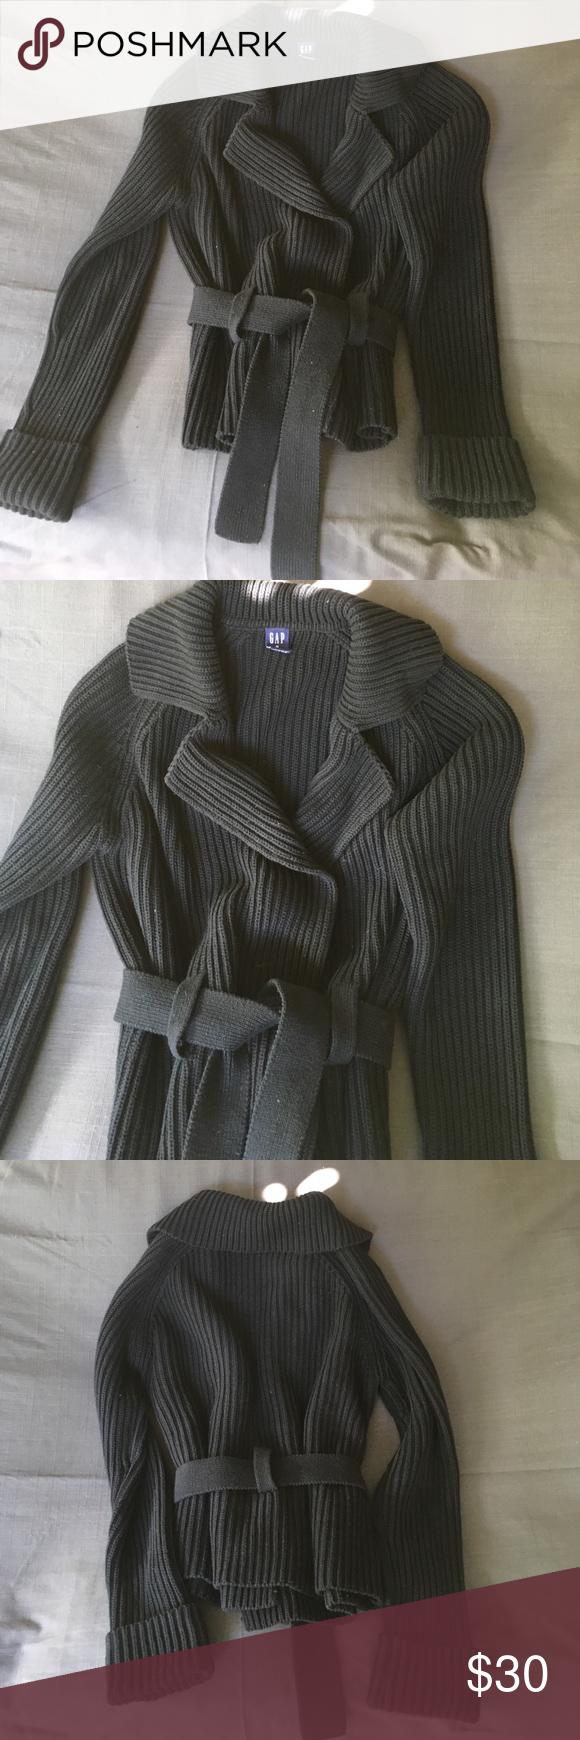 Fabulous Gap sweater jacket Great fitting heavy cotton sweater ...